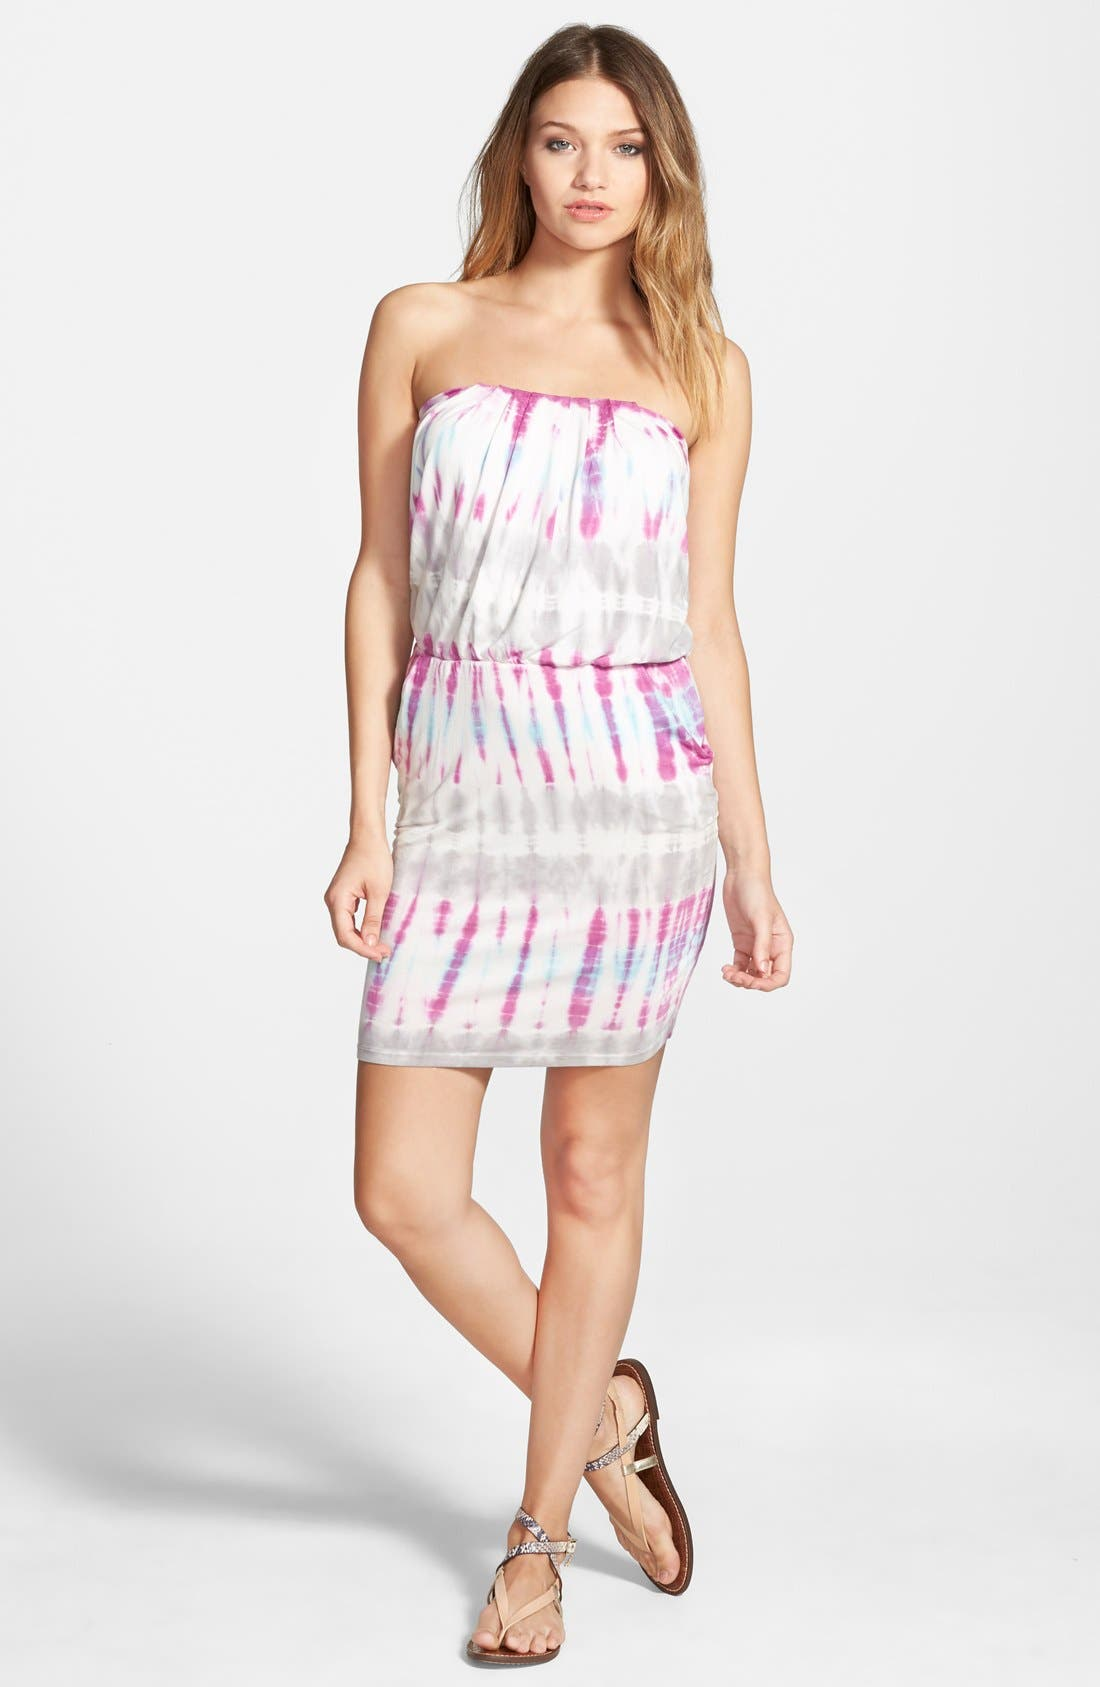 Main Image - Young, Fabulous & Broke 'Freya' Strapless Tie Dye Dress